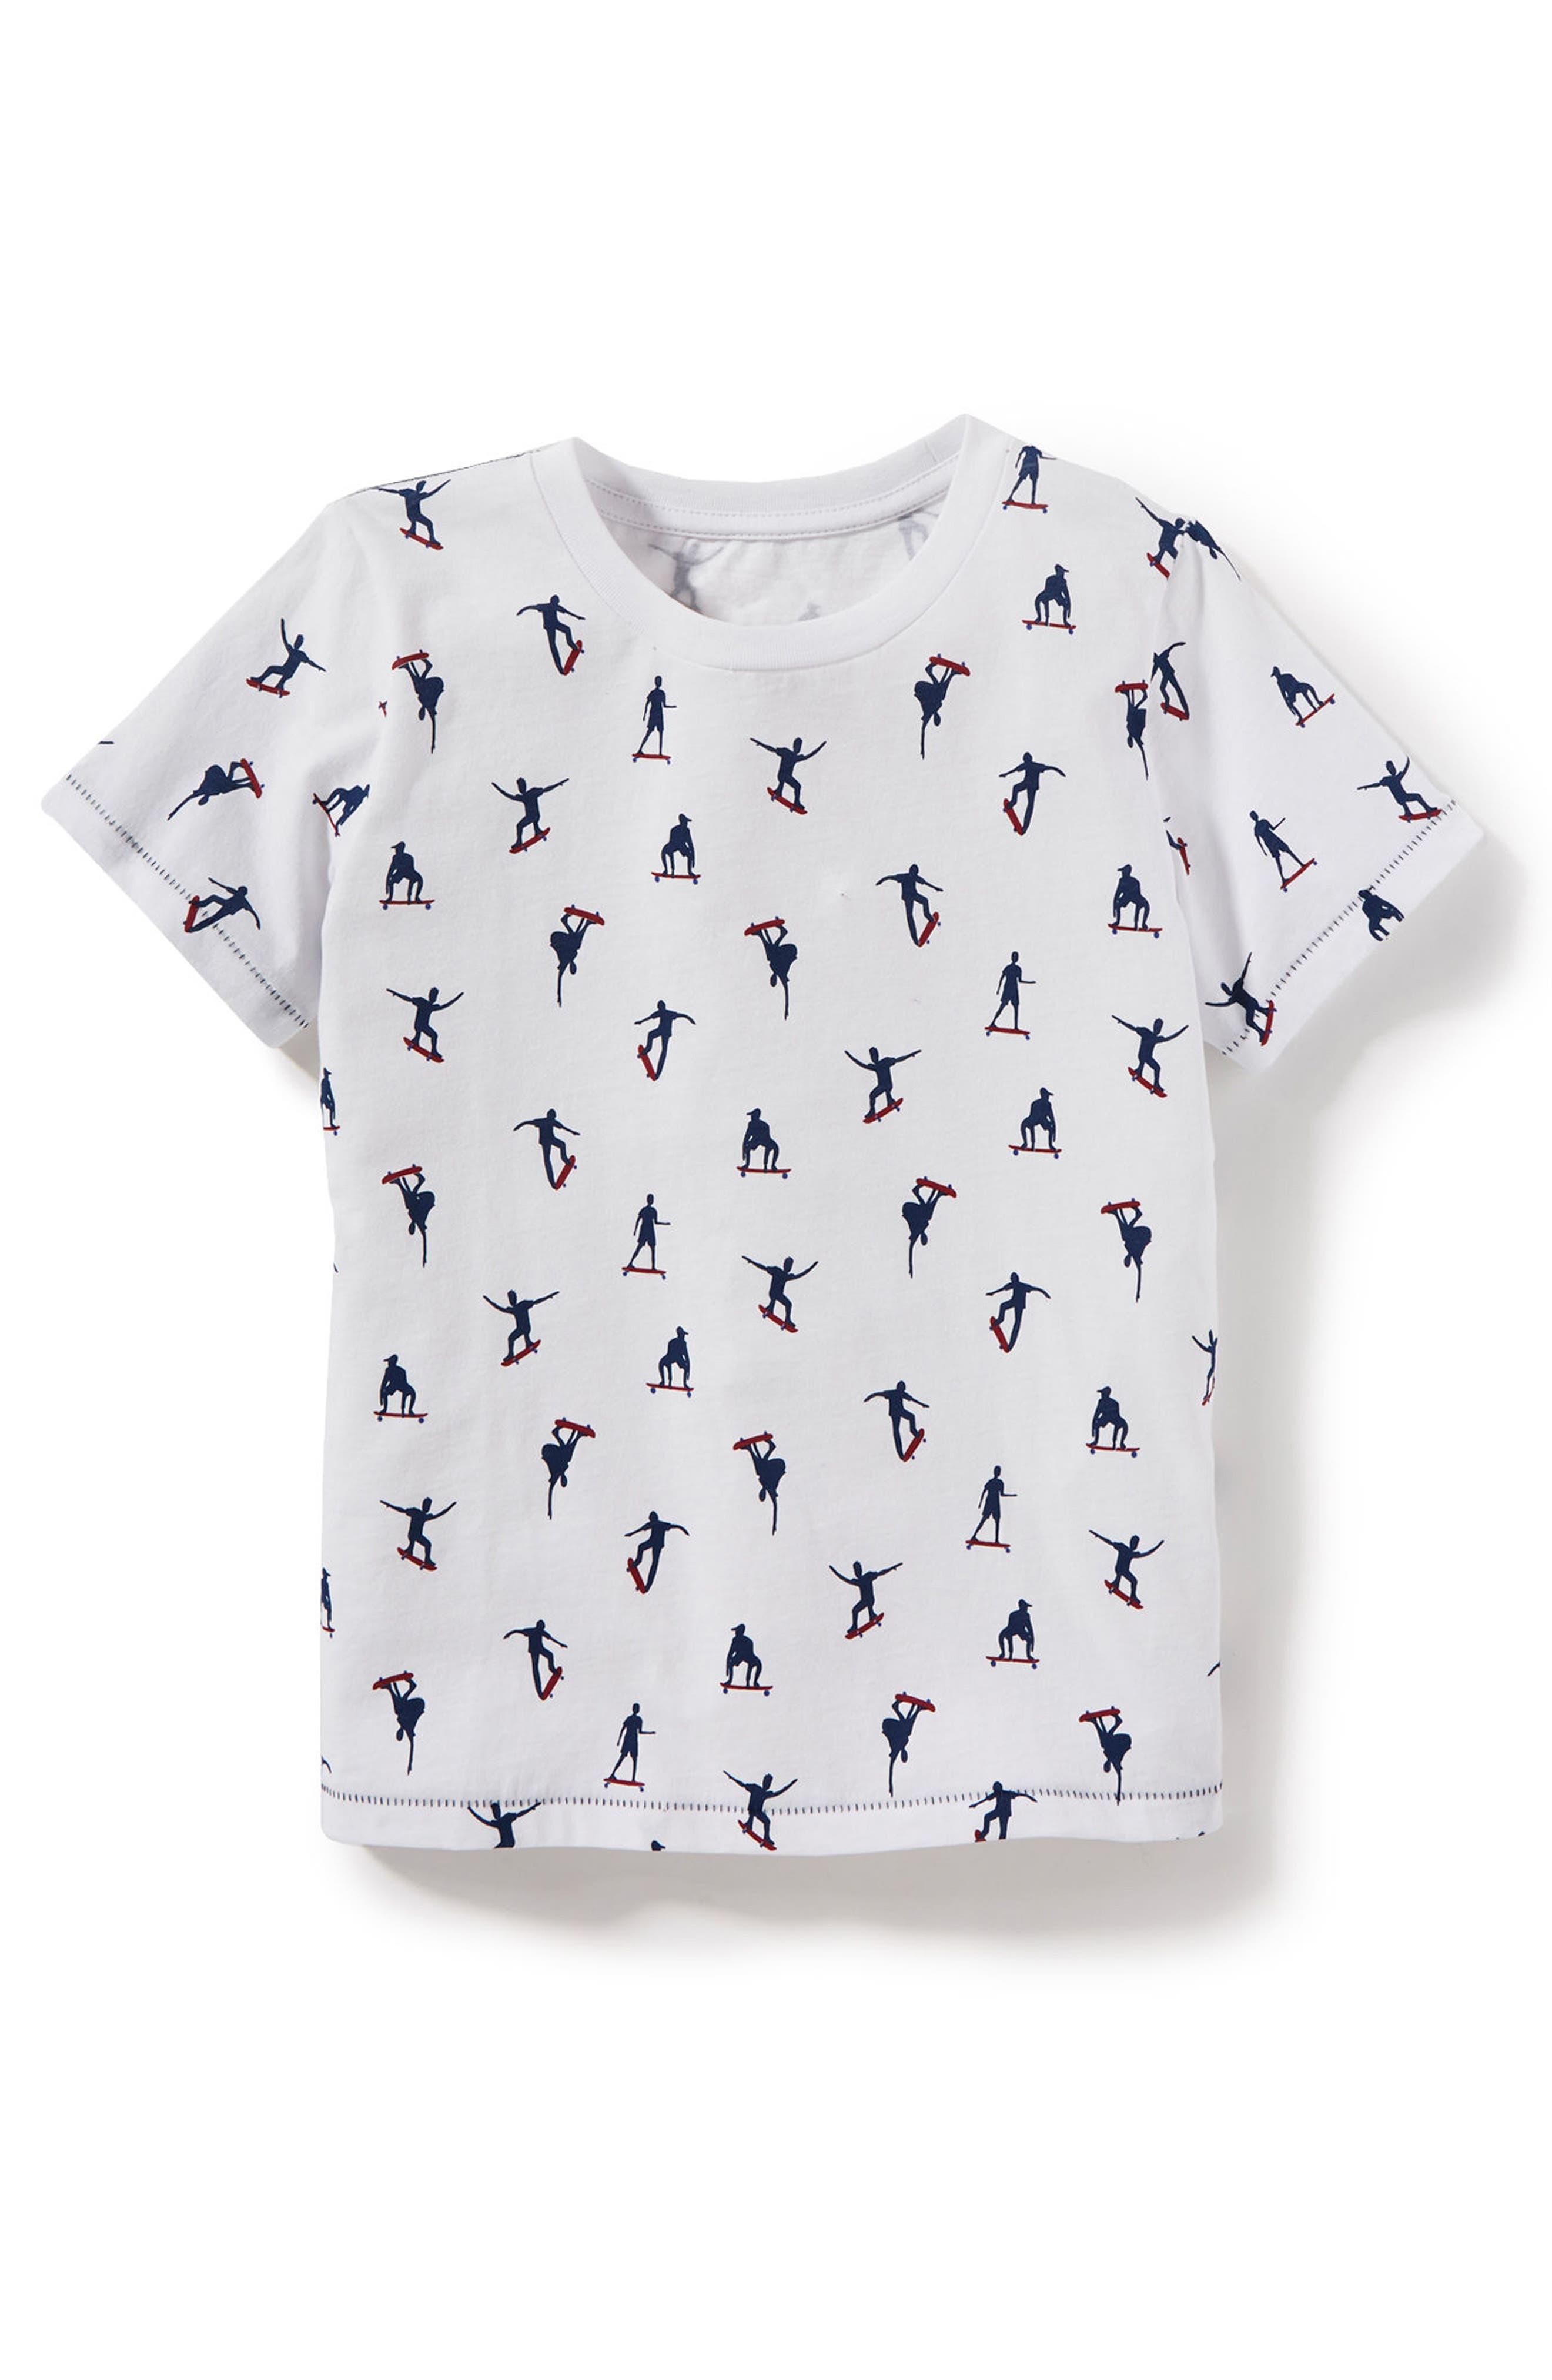 Peek Skateboarder Graphic T-Shirt (Toddler Boys, Little Boys & Big Boys)